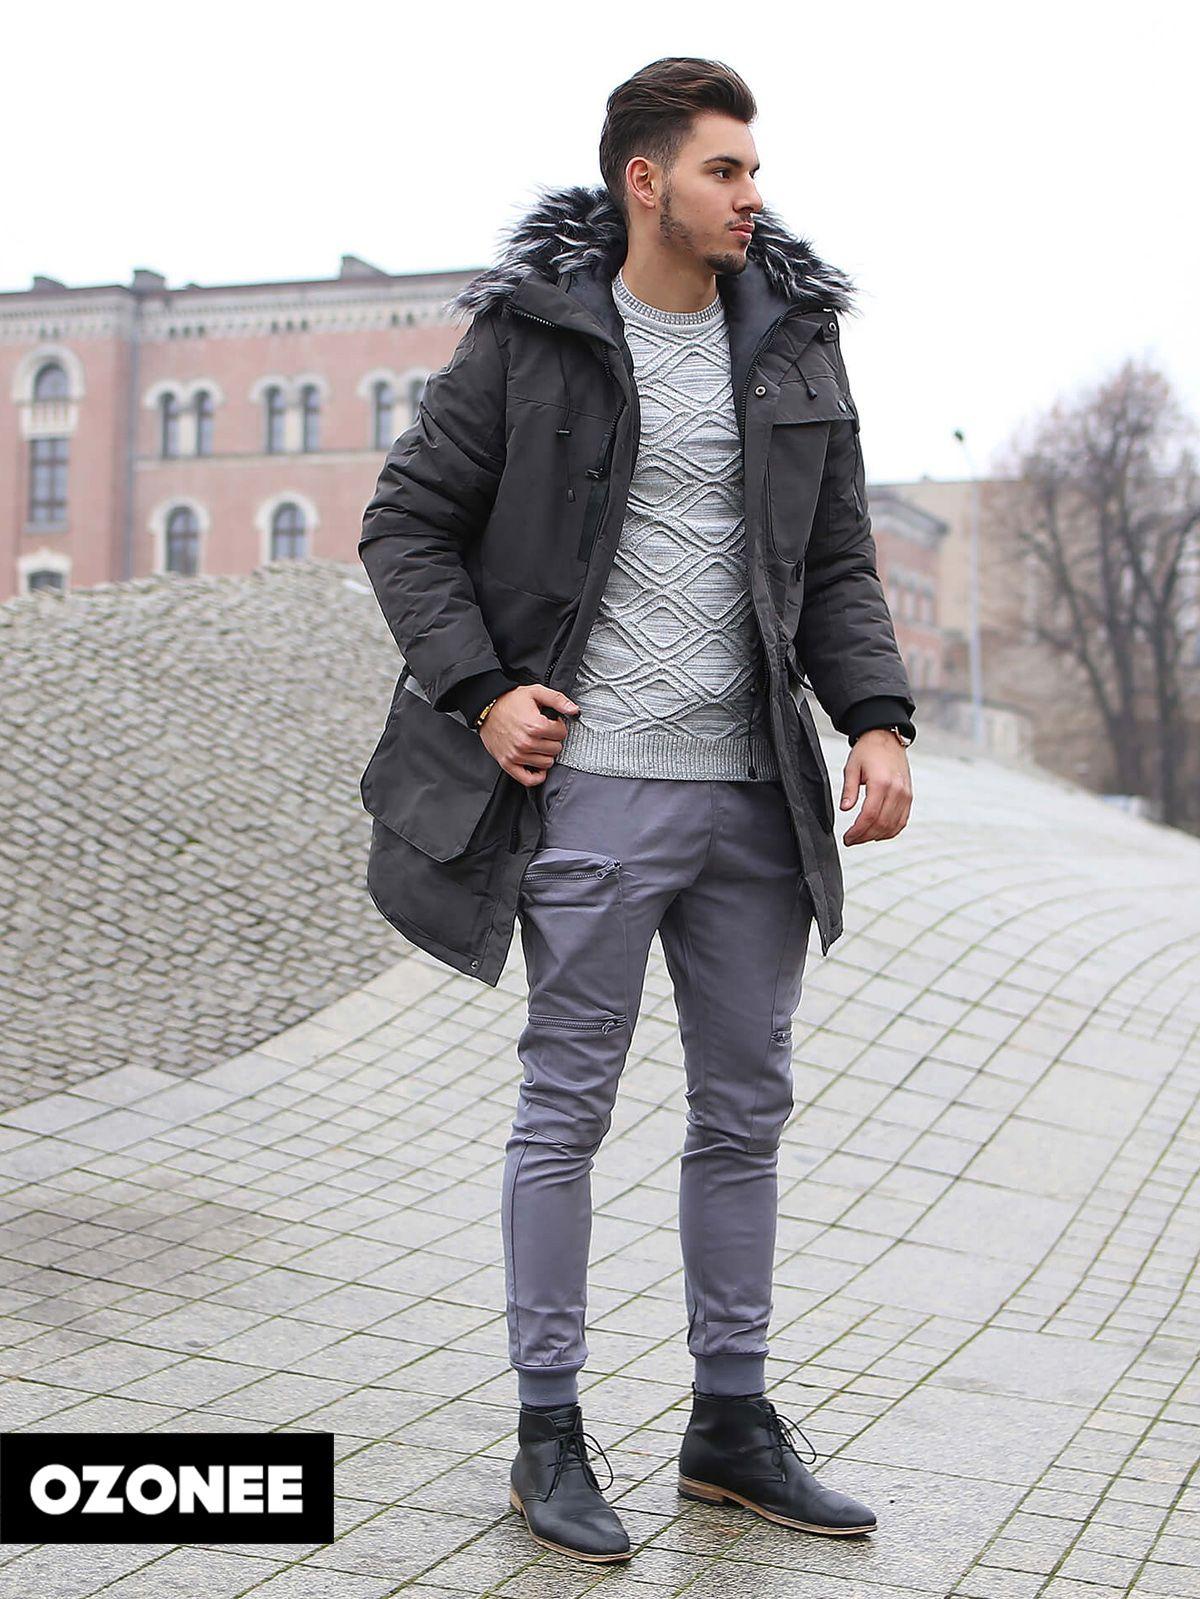 Ozonee Modameska Ootd Casual Stylizacja Misterpolski Look Outfit Mensfashion Cool Polishboy Polishman Polskichlopa Jackets Winter Jackets Fashion